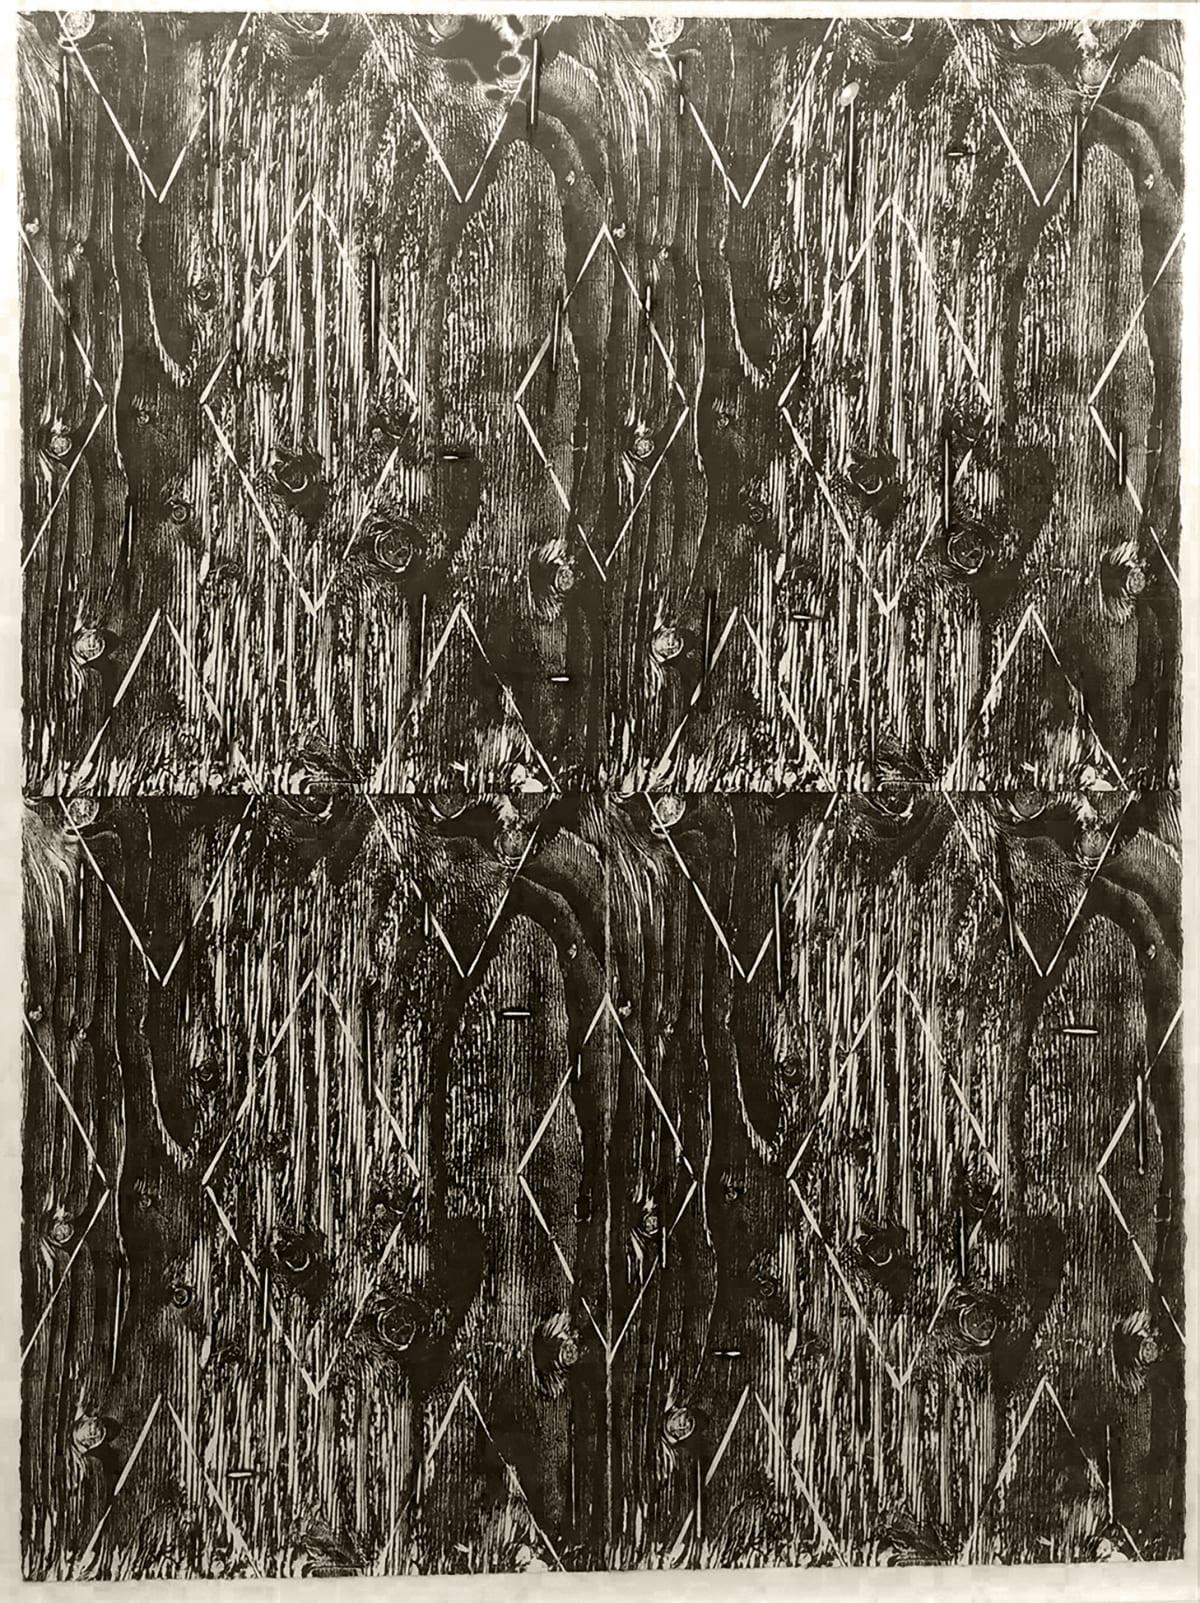 Kathleen Kucka, Heartwood Black, 2019